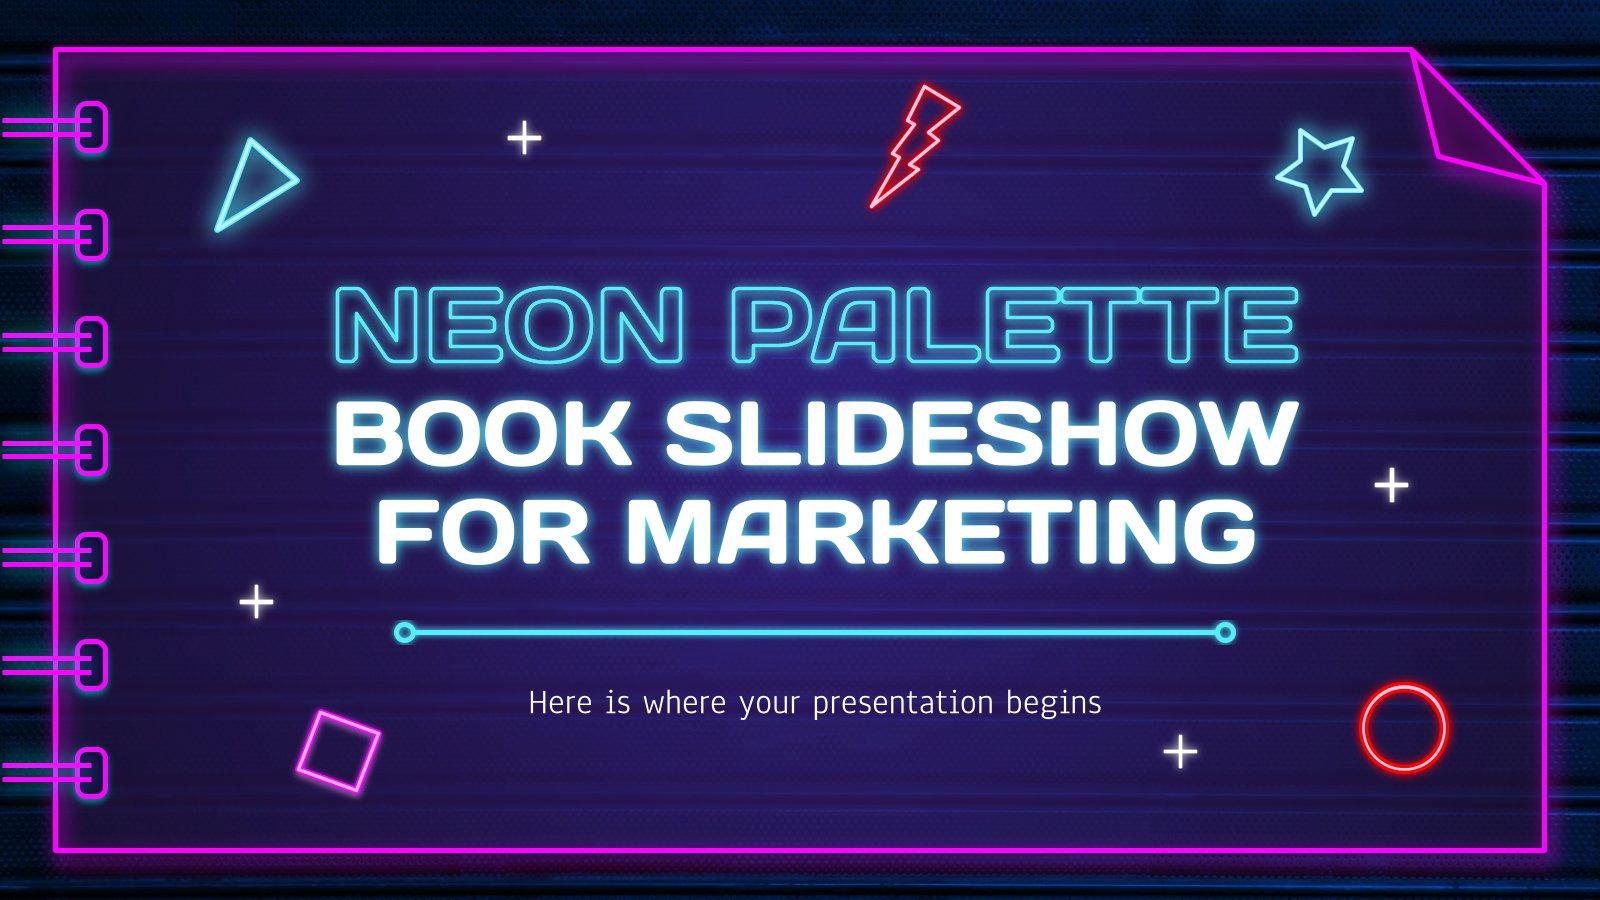 Neon Palette Book Slideshow for Marketing presentation template